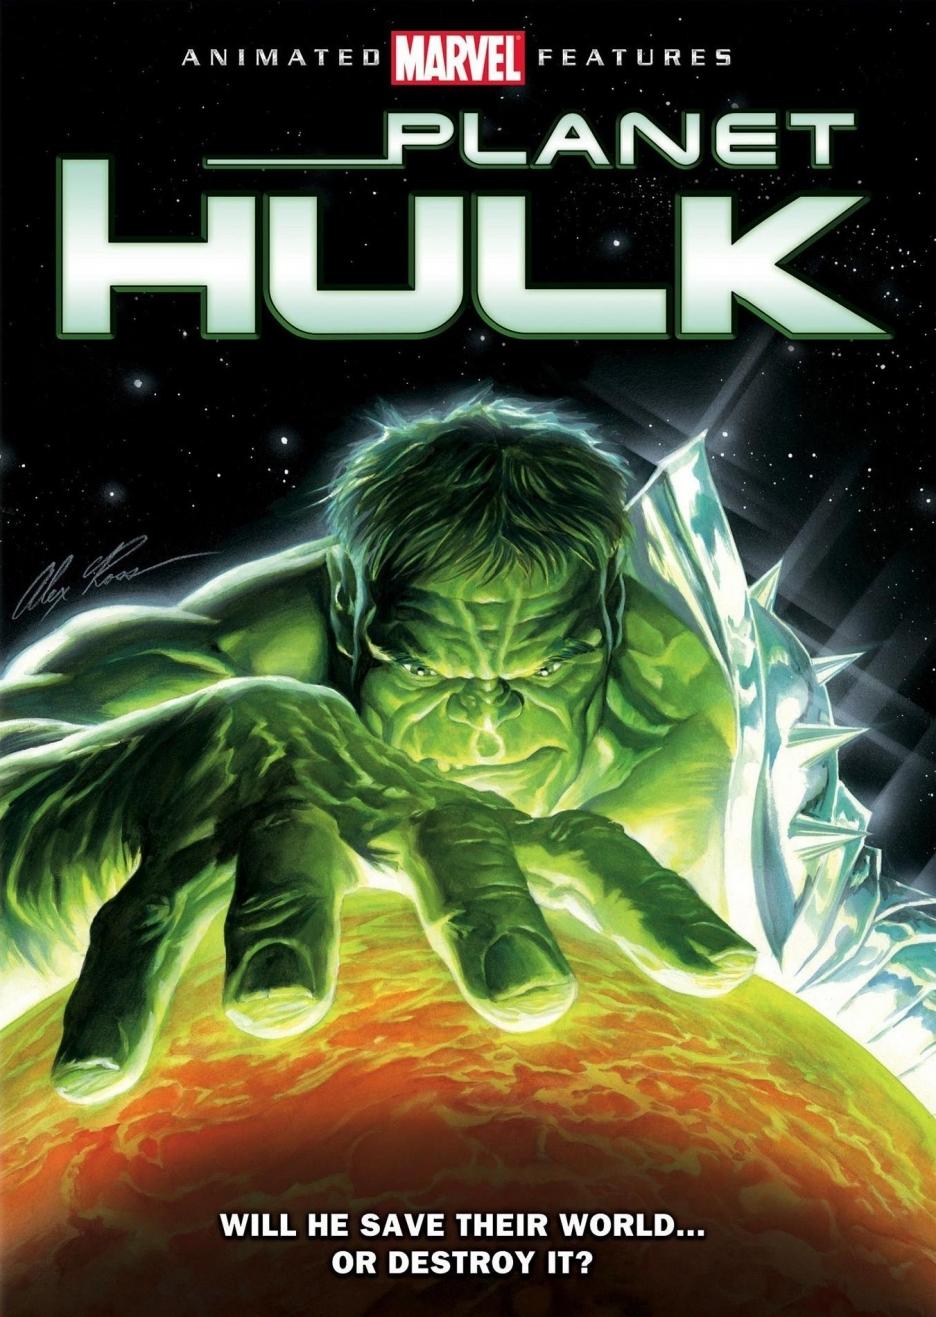 hulk movie download in hindi worldfree4u